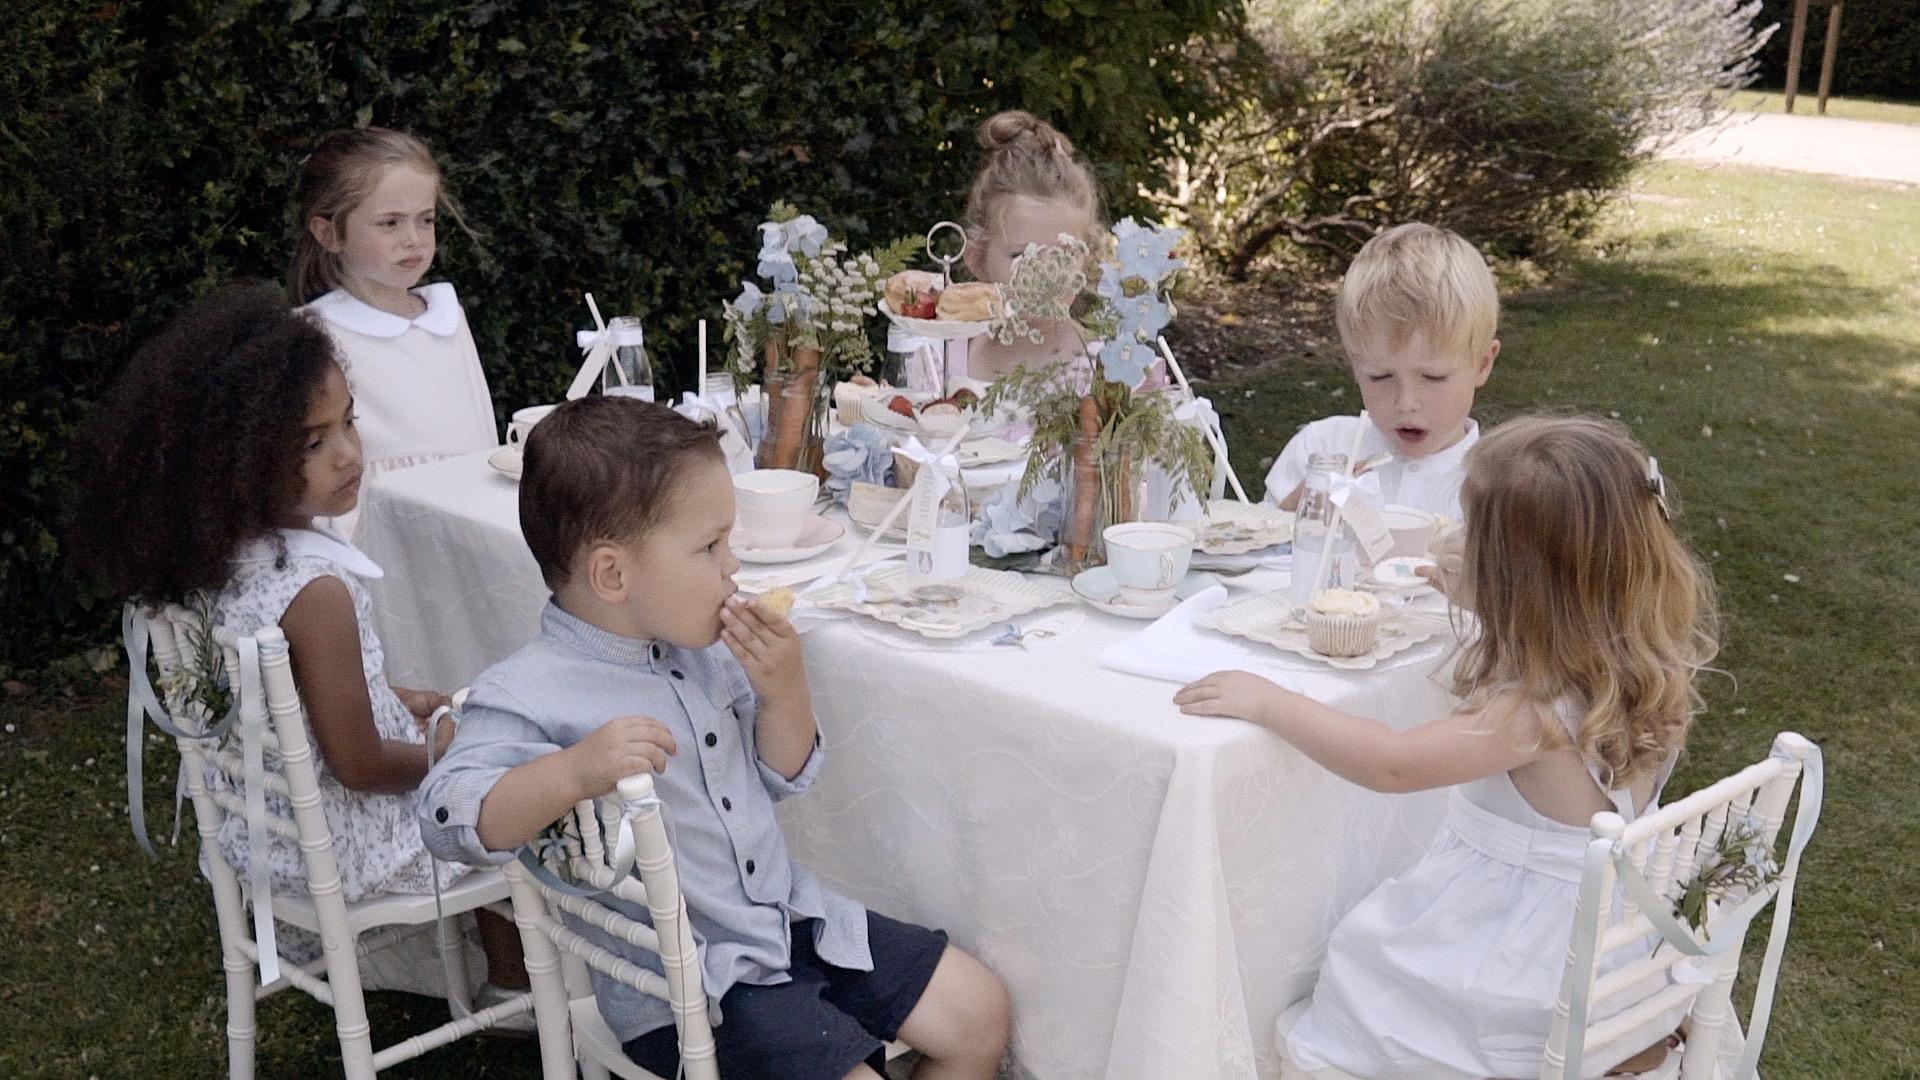 Luke Batchelor Productions Peter Rabbit Party Nurstead Court